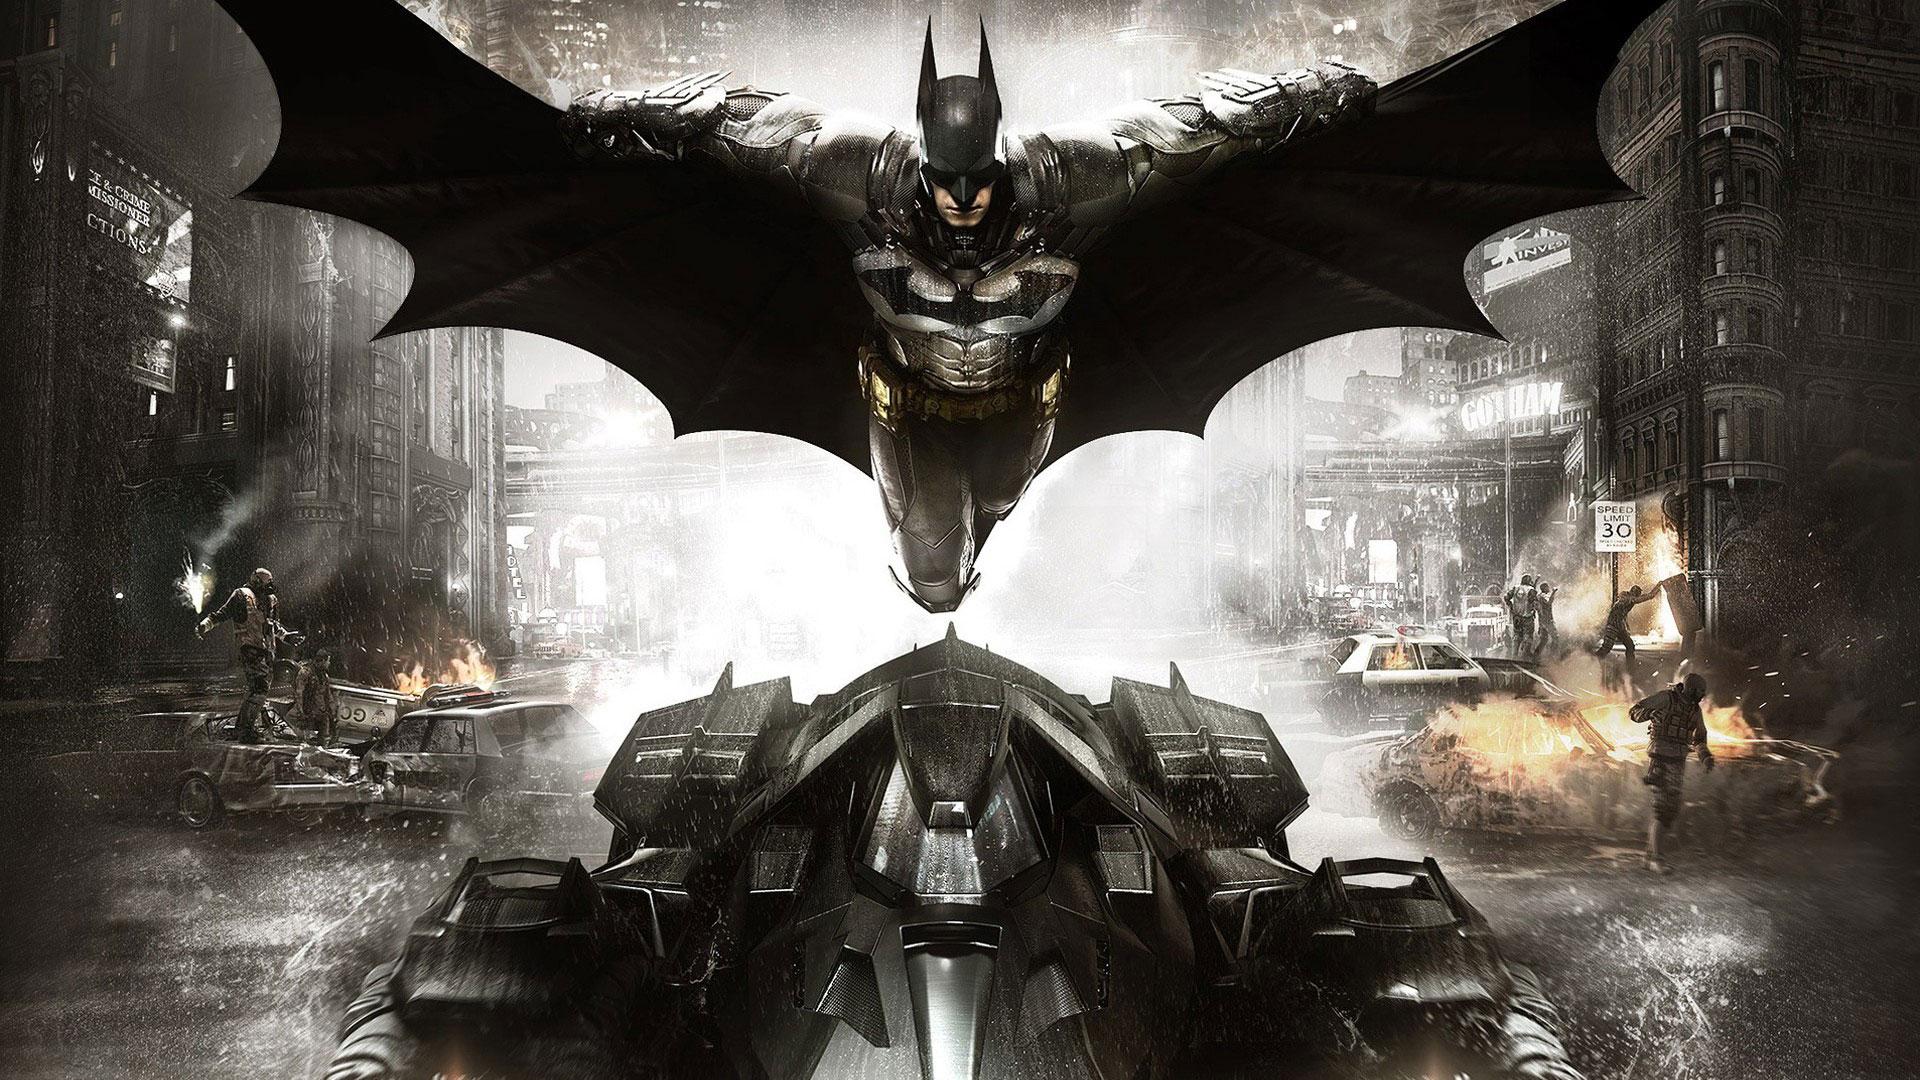 sedge蝙蝠侠壁纸_蝙蝠侠壁纸高清_蝙蝠侠大战超人_蝙蝠侠壁纸